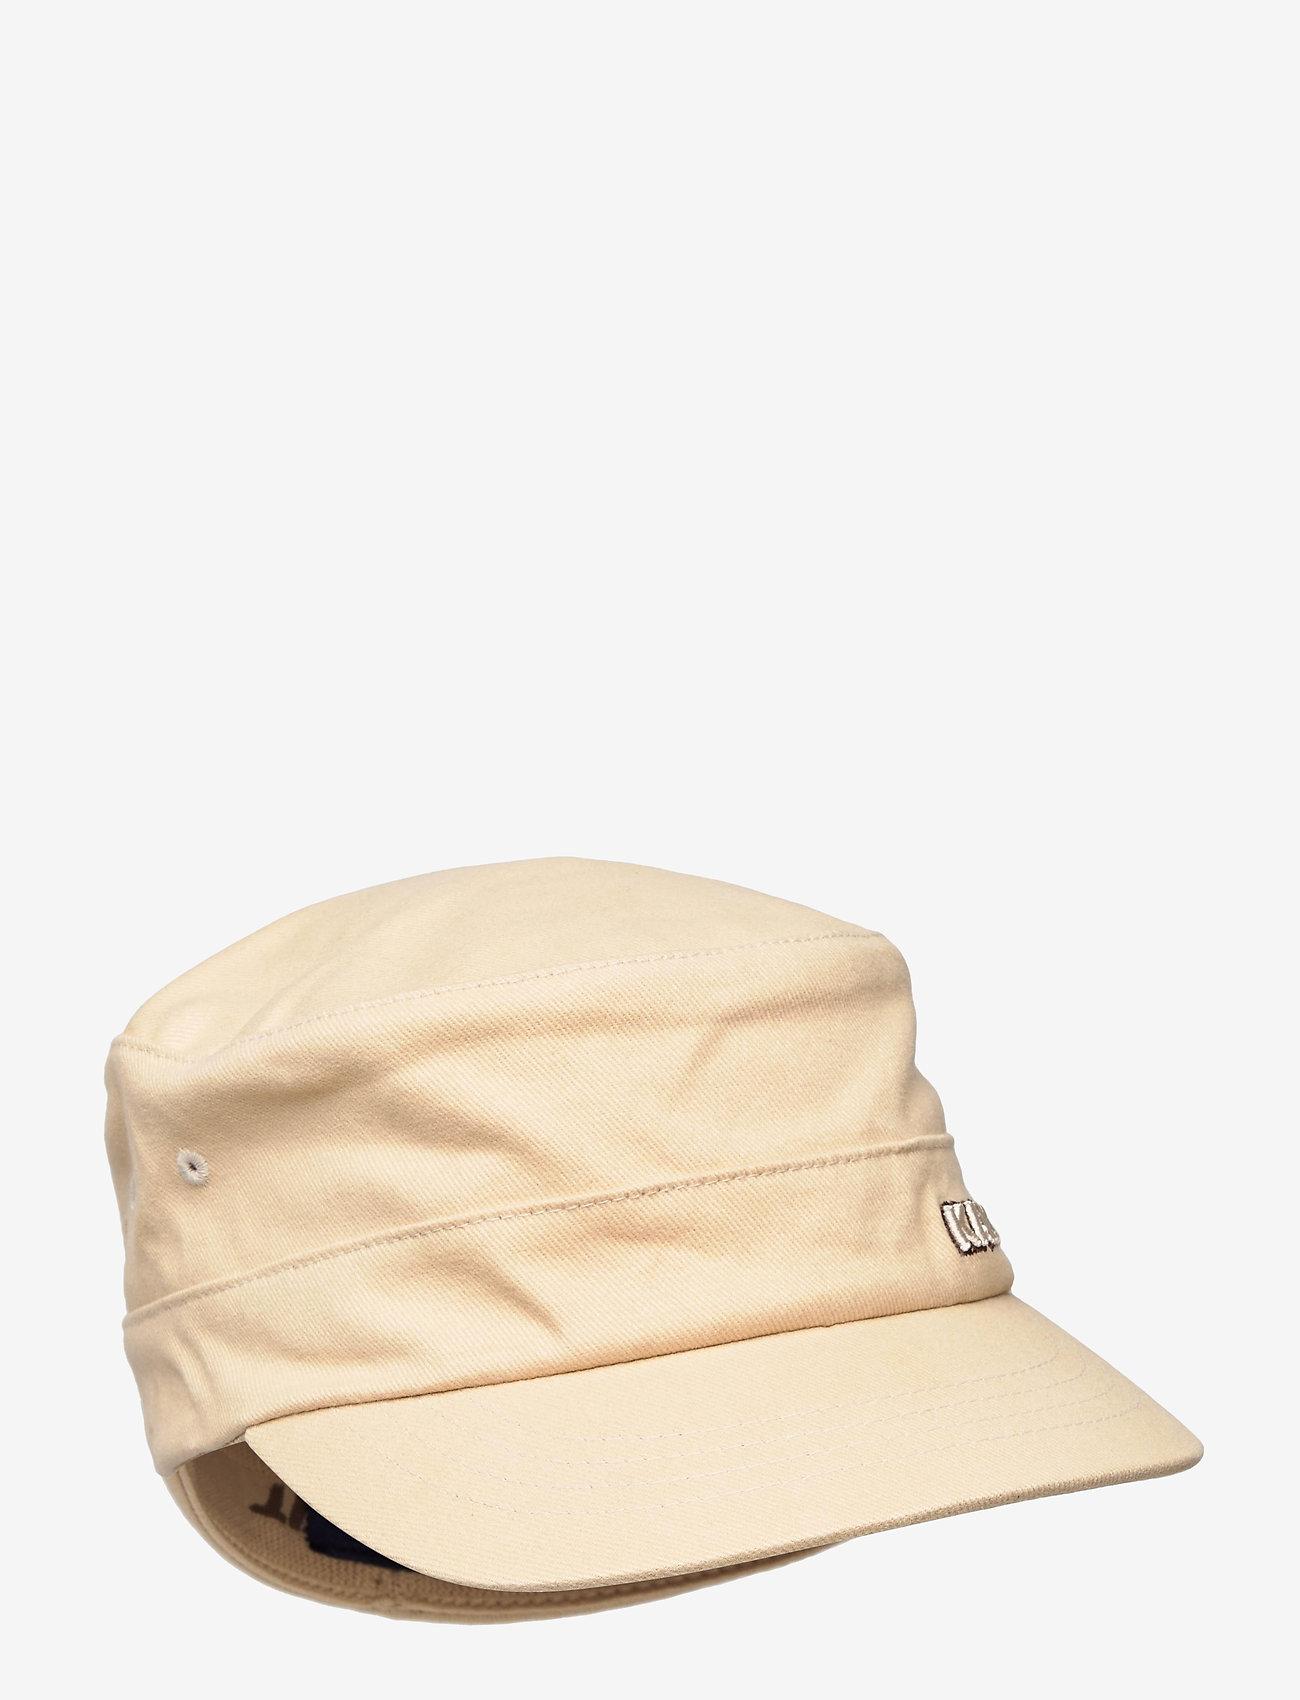 Kangol - KG COTTON TWILL ARMY CAP - kasketter - beige - 0